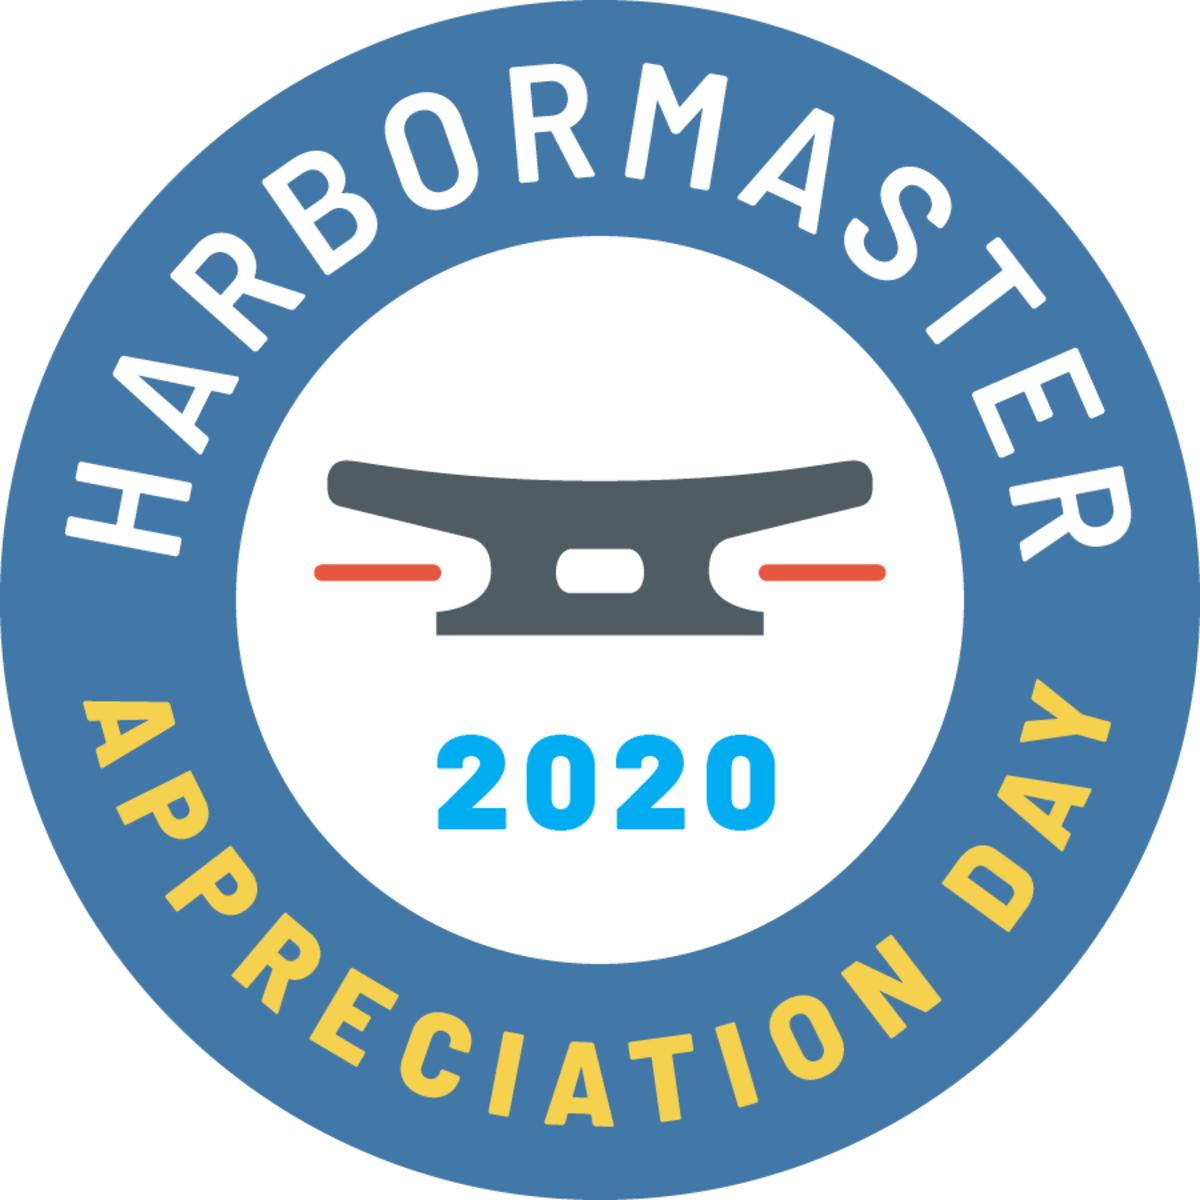 1_Harbormaster